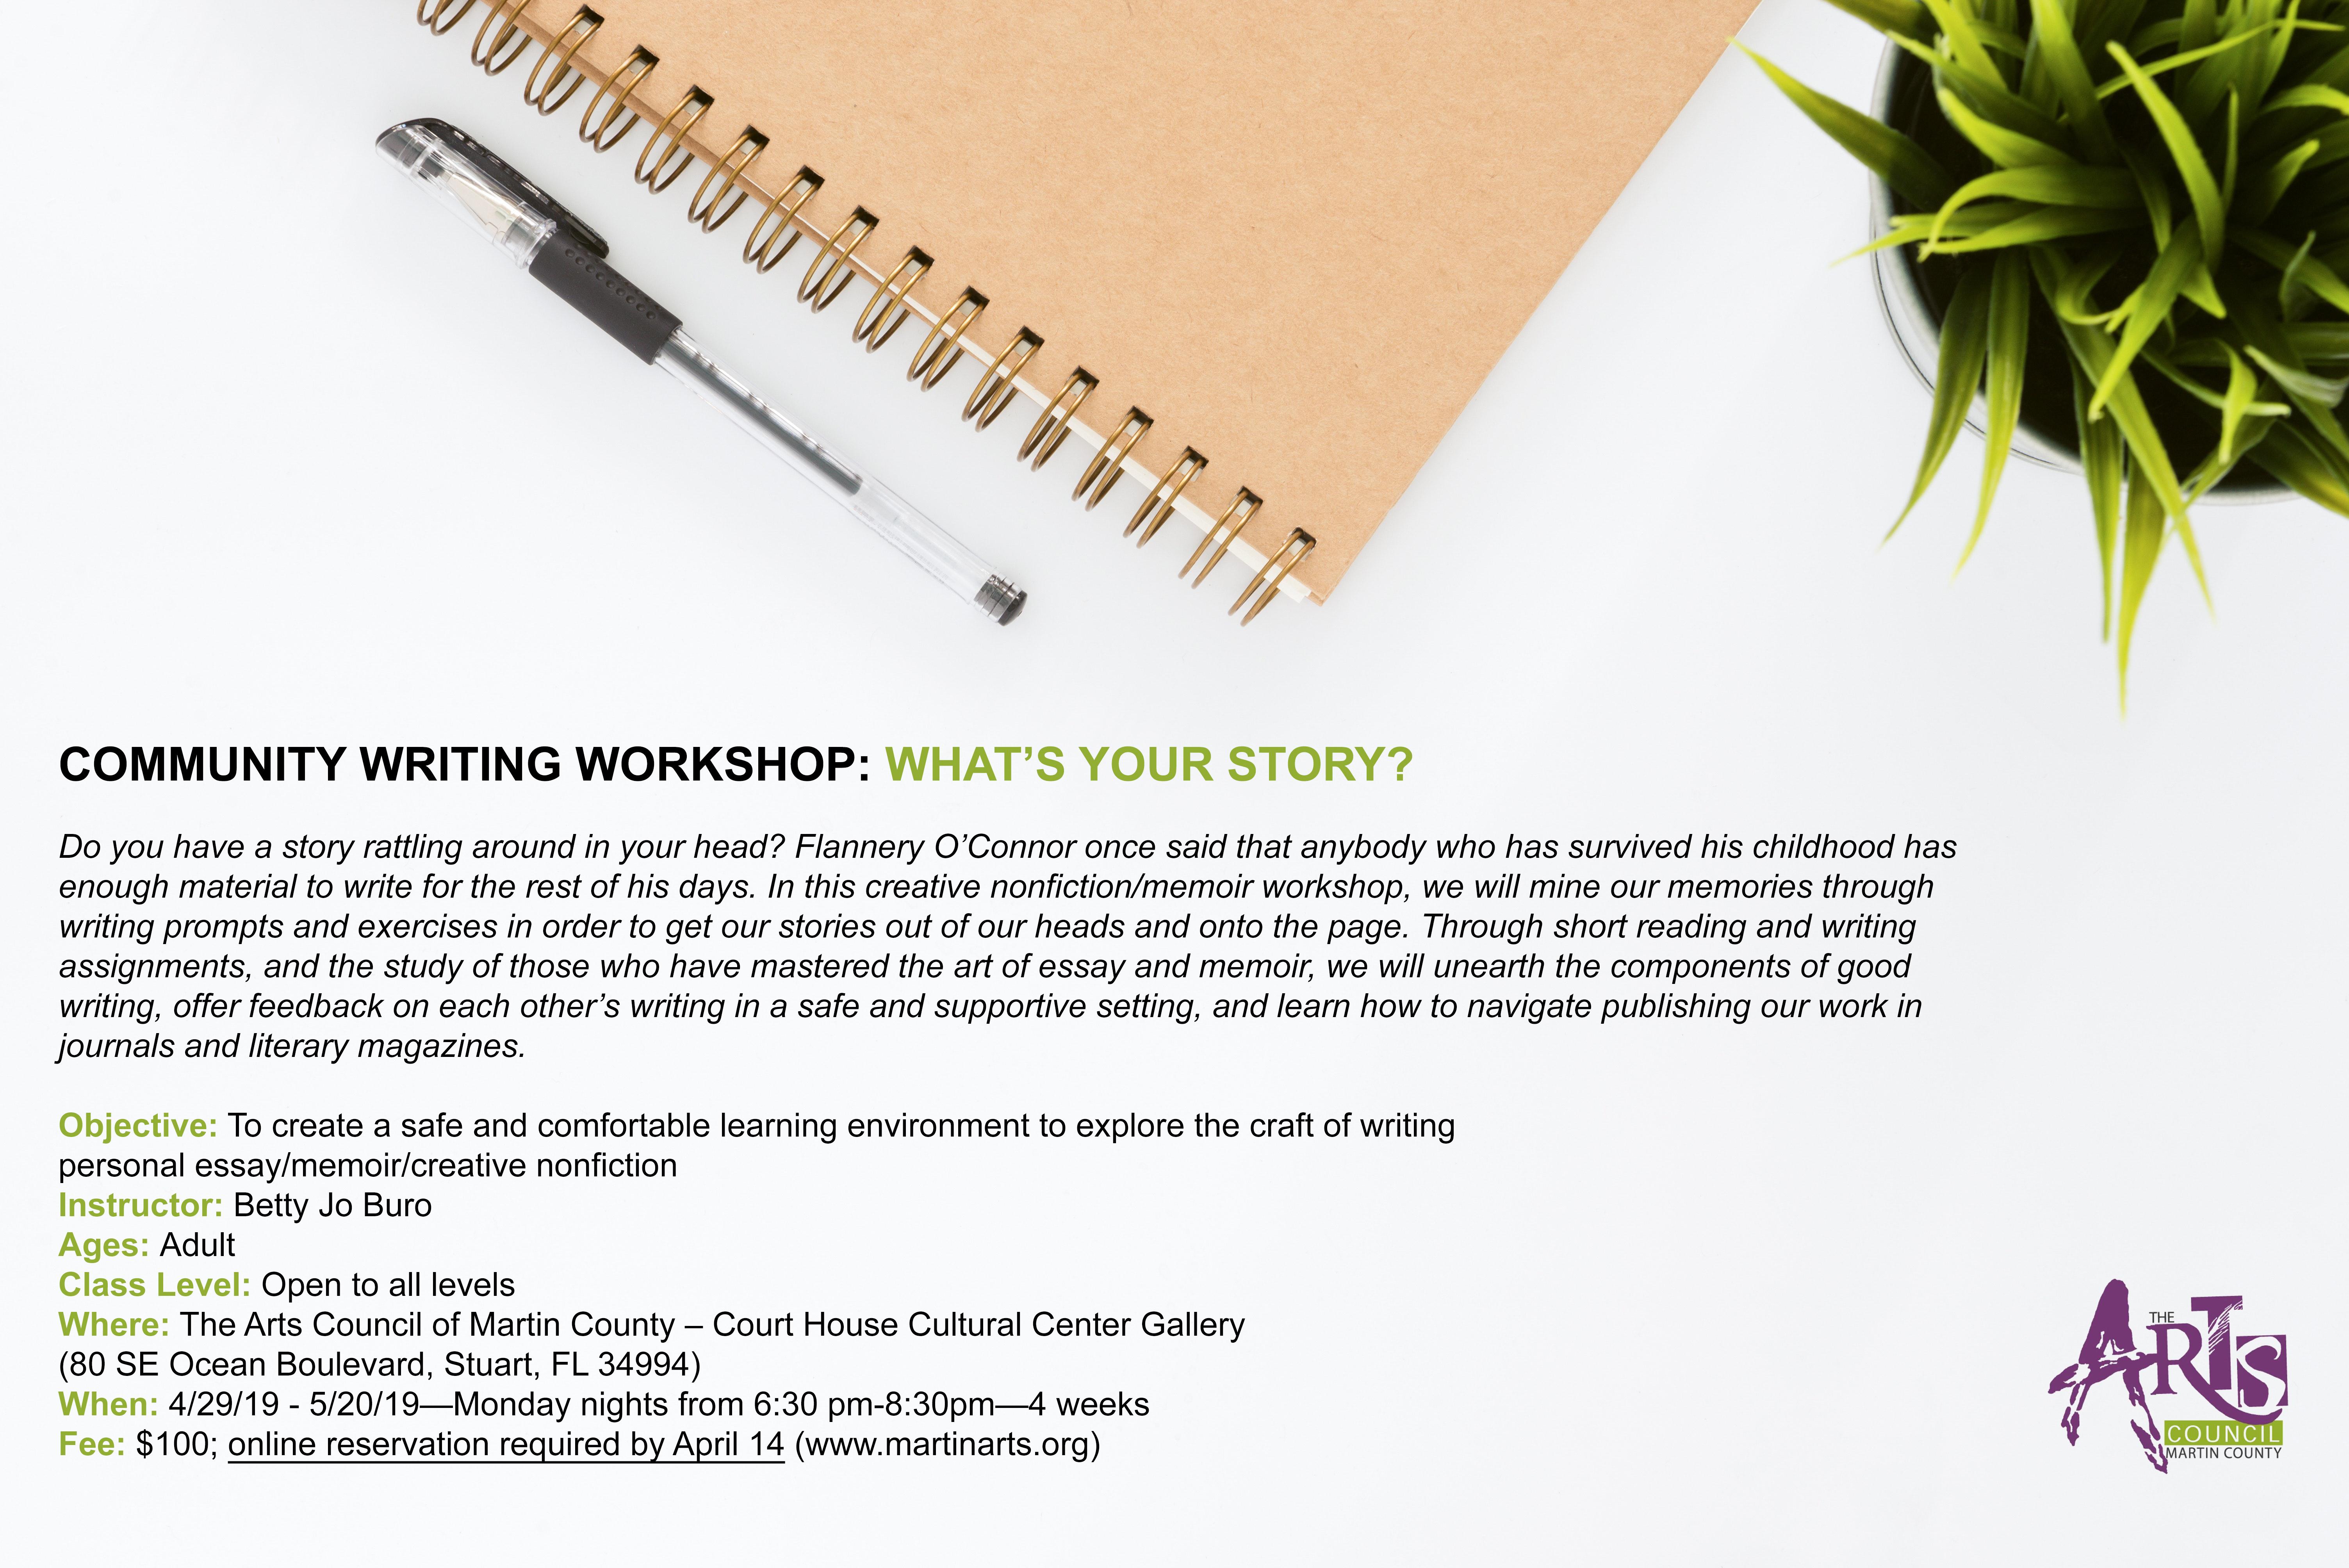 COMMUNITY WRITING WORKSHOP